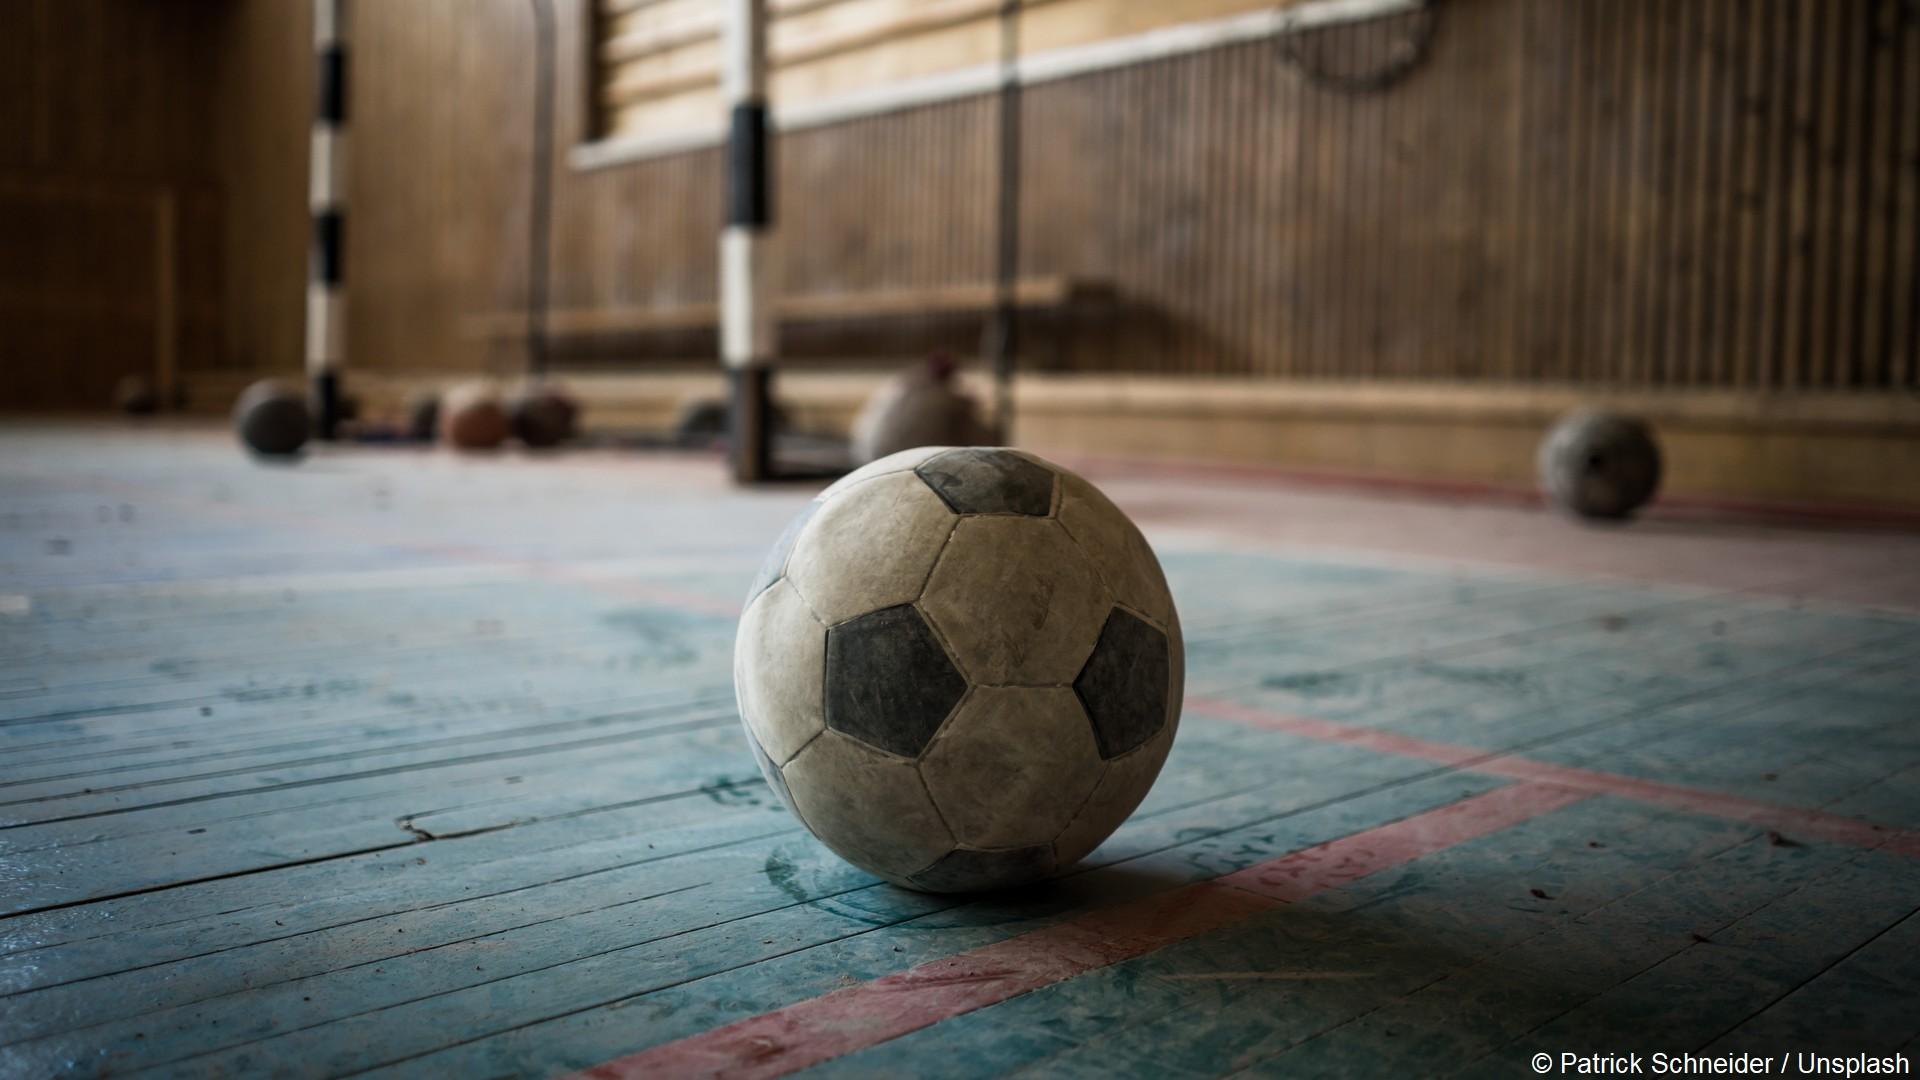 Ballons salle sport école